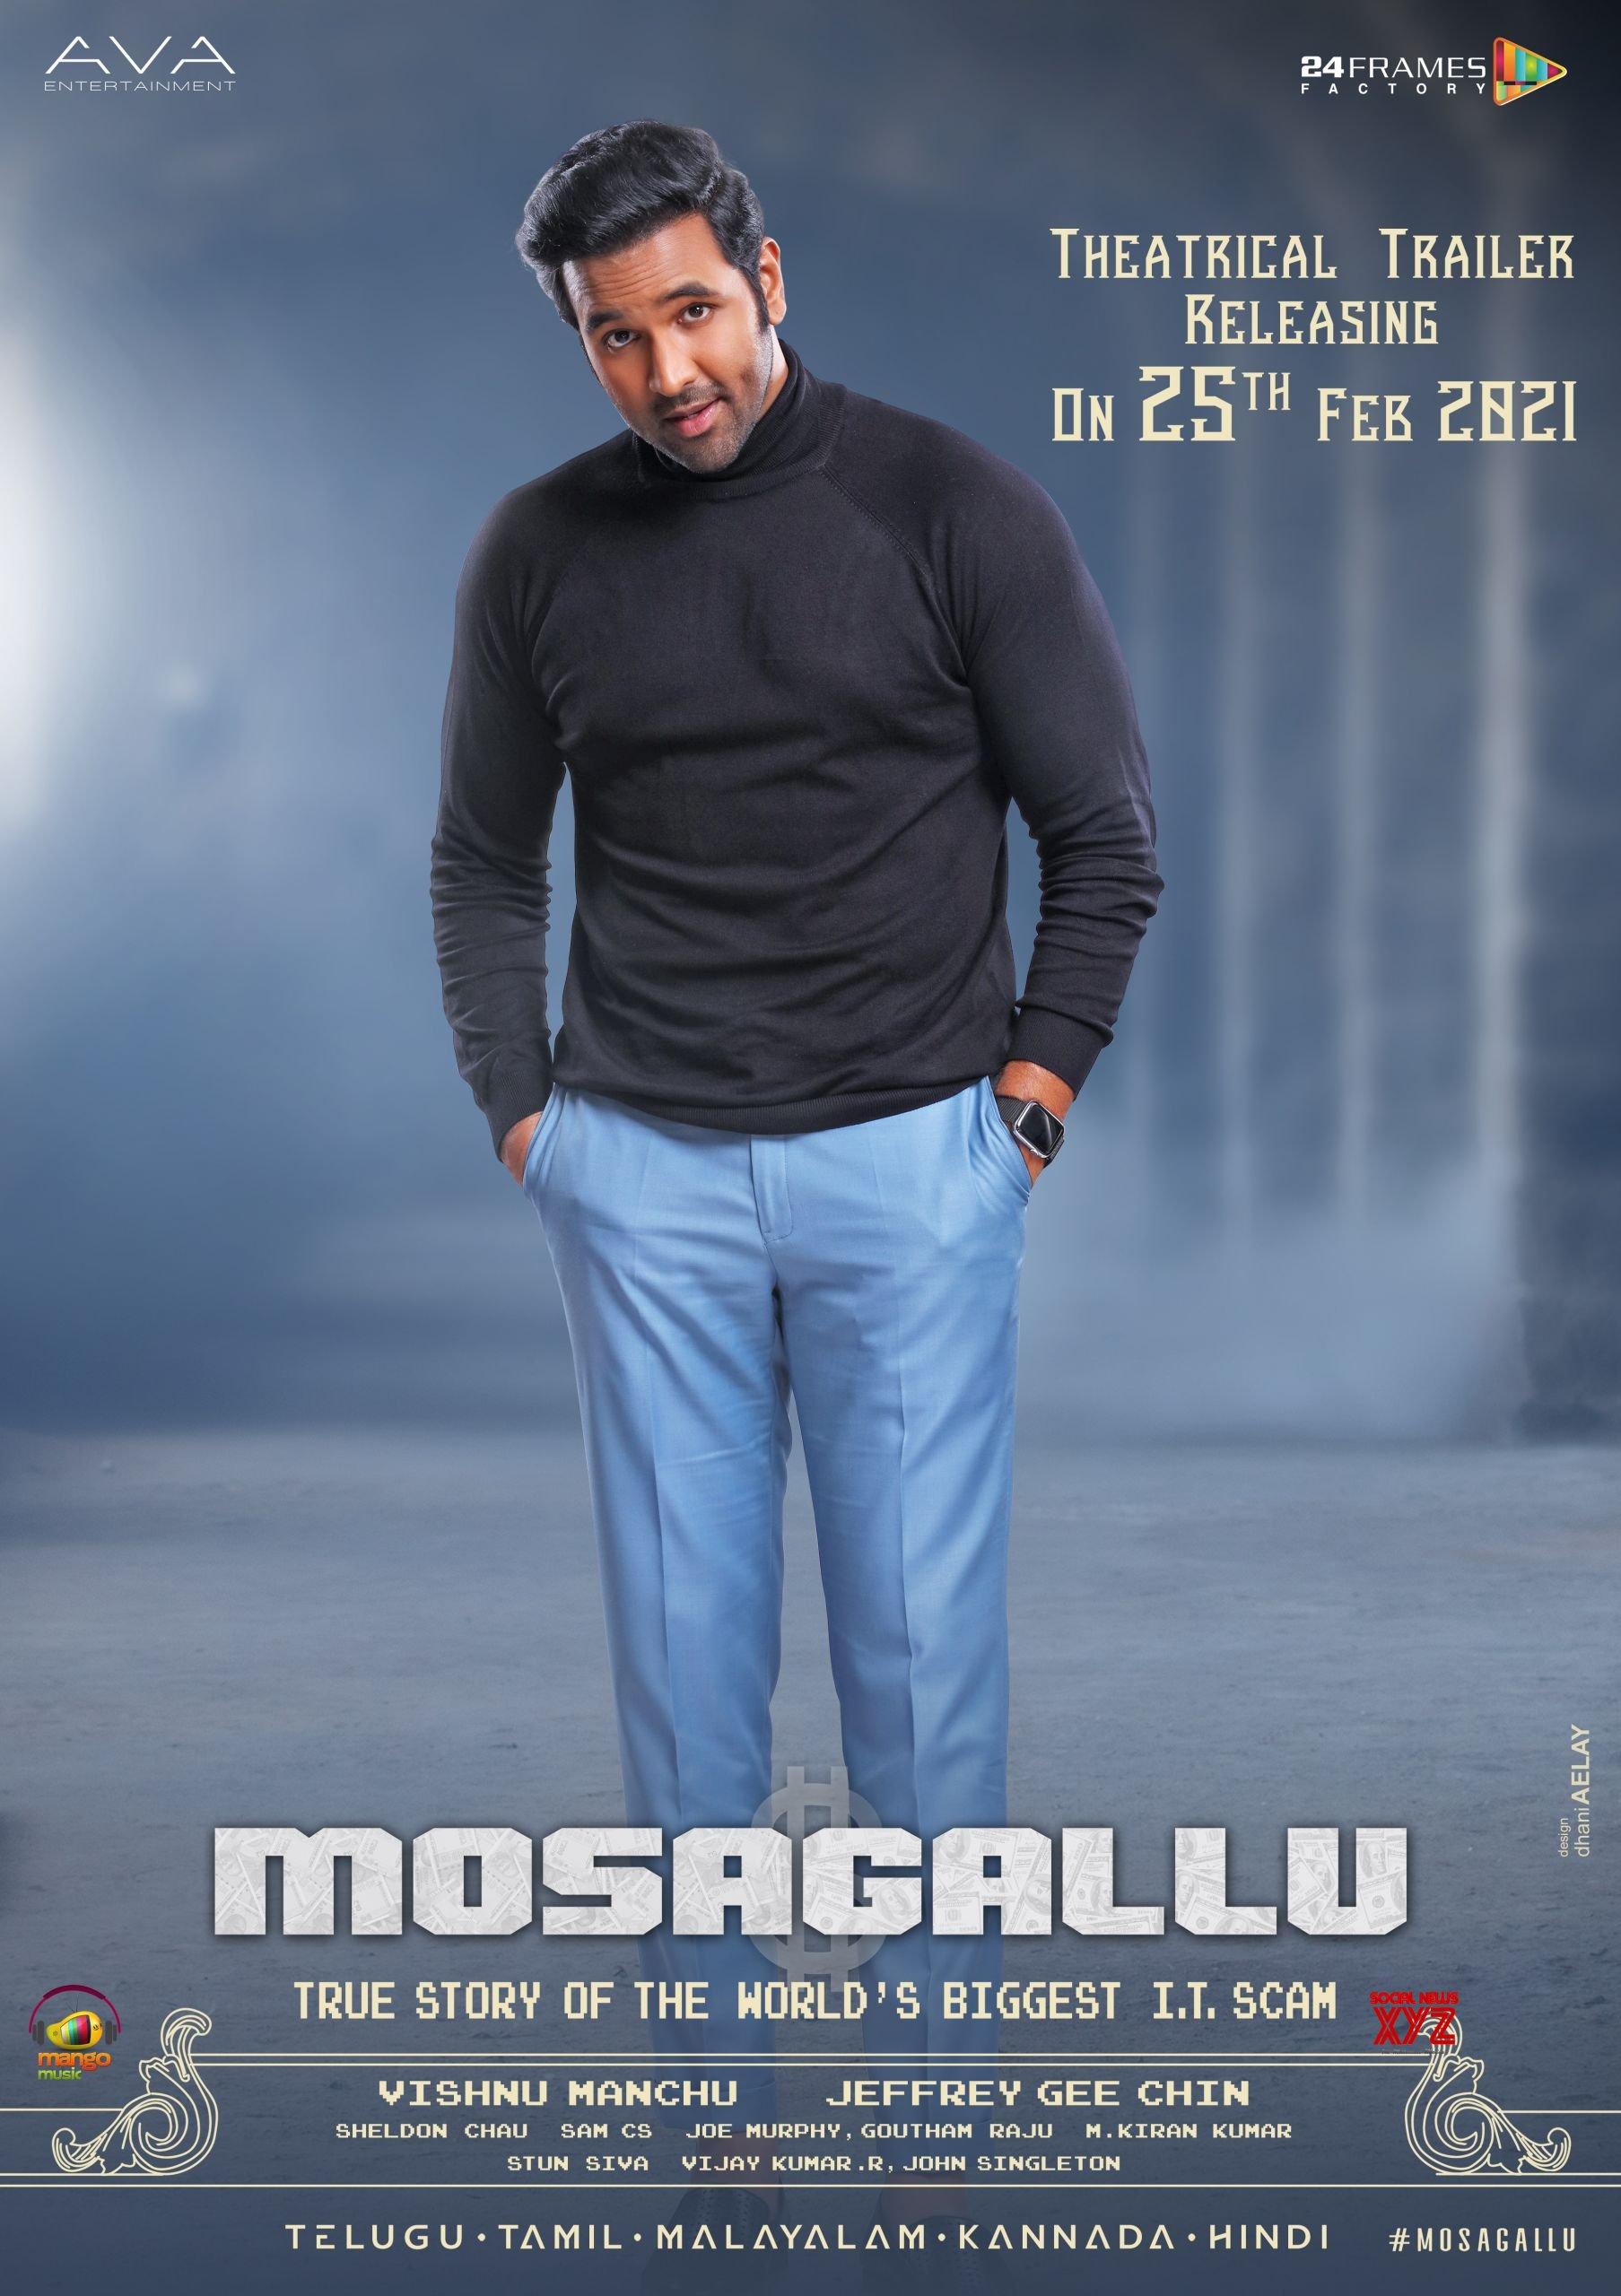 Vishnu Manchu's Mosagallu Theatrical Trailer On February 25th